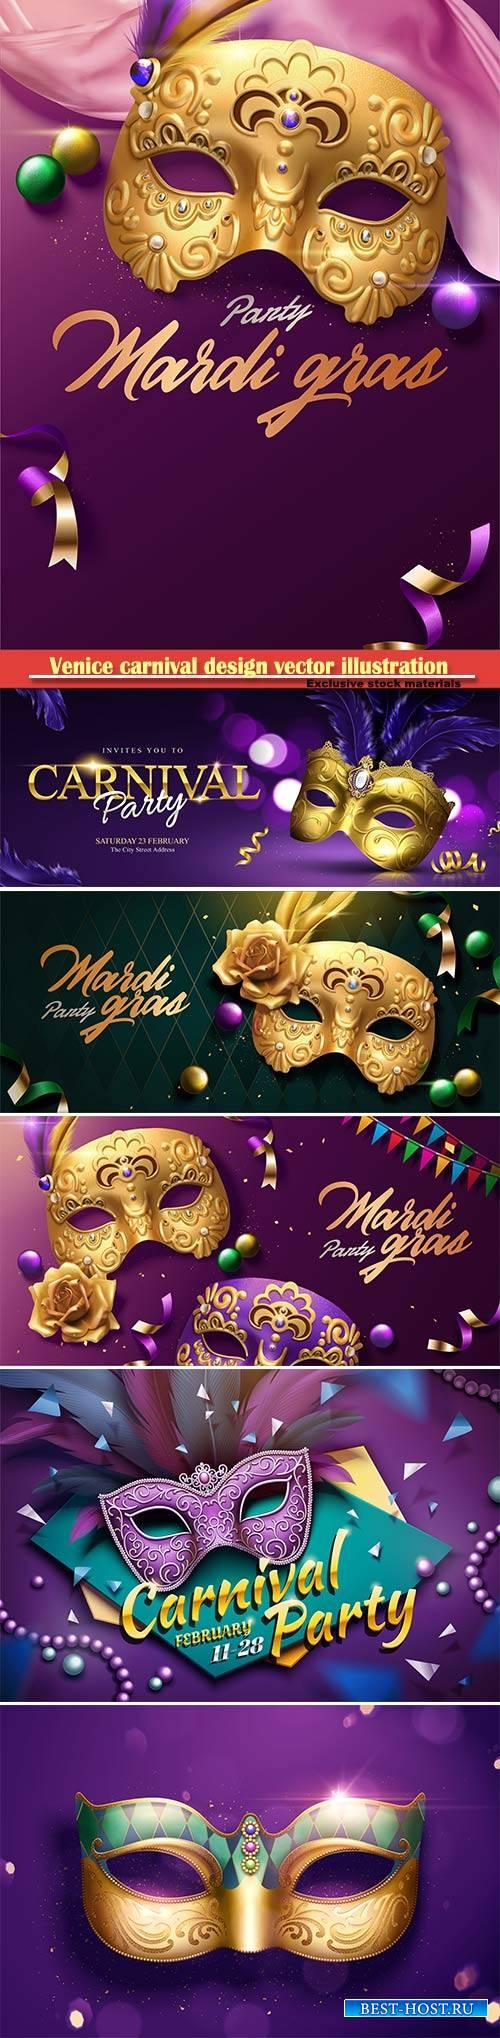 Venice carnival design vector illustration, Mardi gras # 8